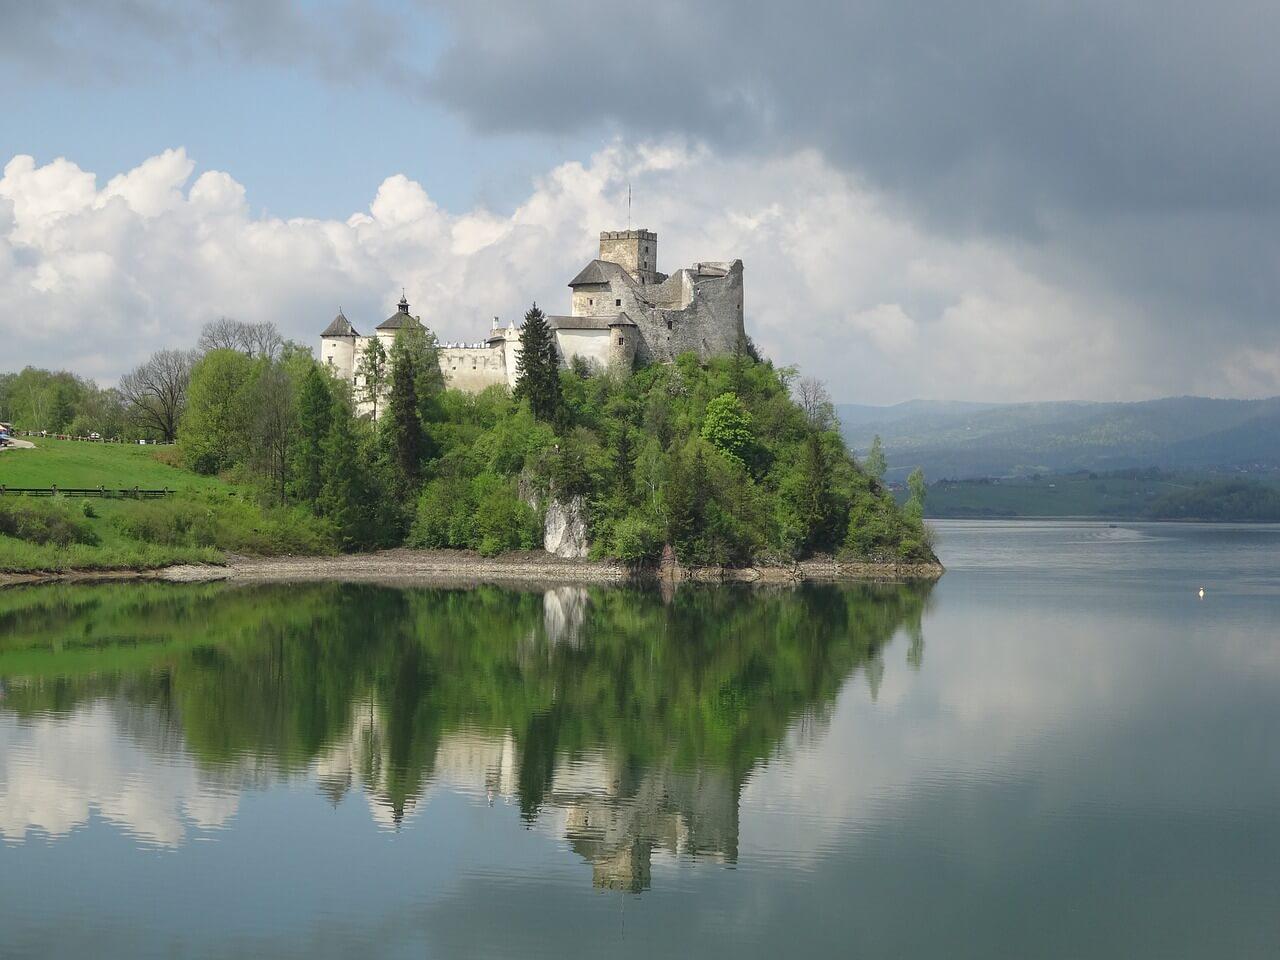 castle-niedzica-905943_1280.jpg